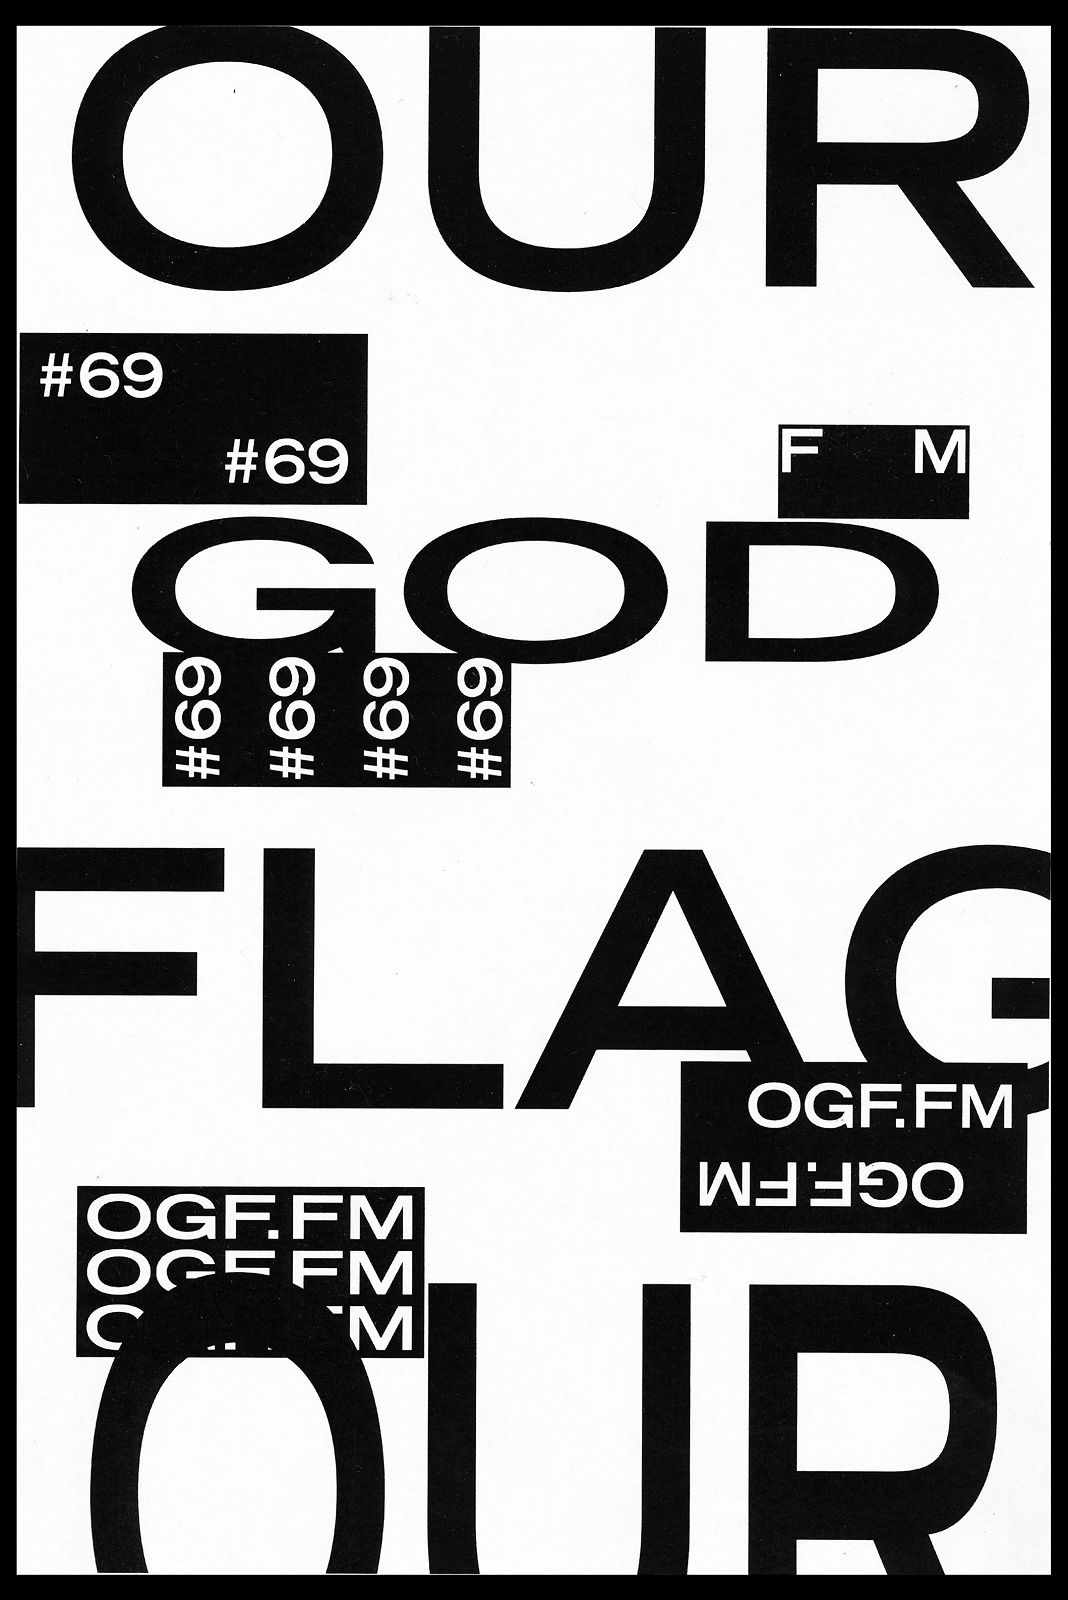 17OGF.FM-BORDER.jpg